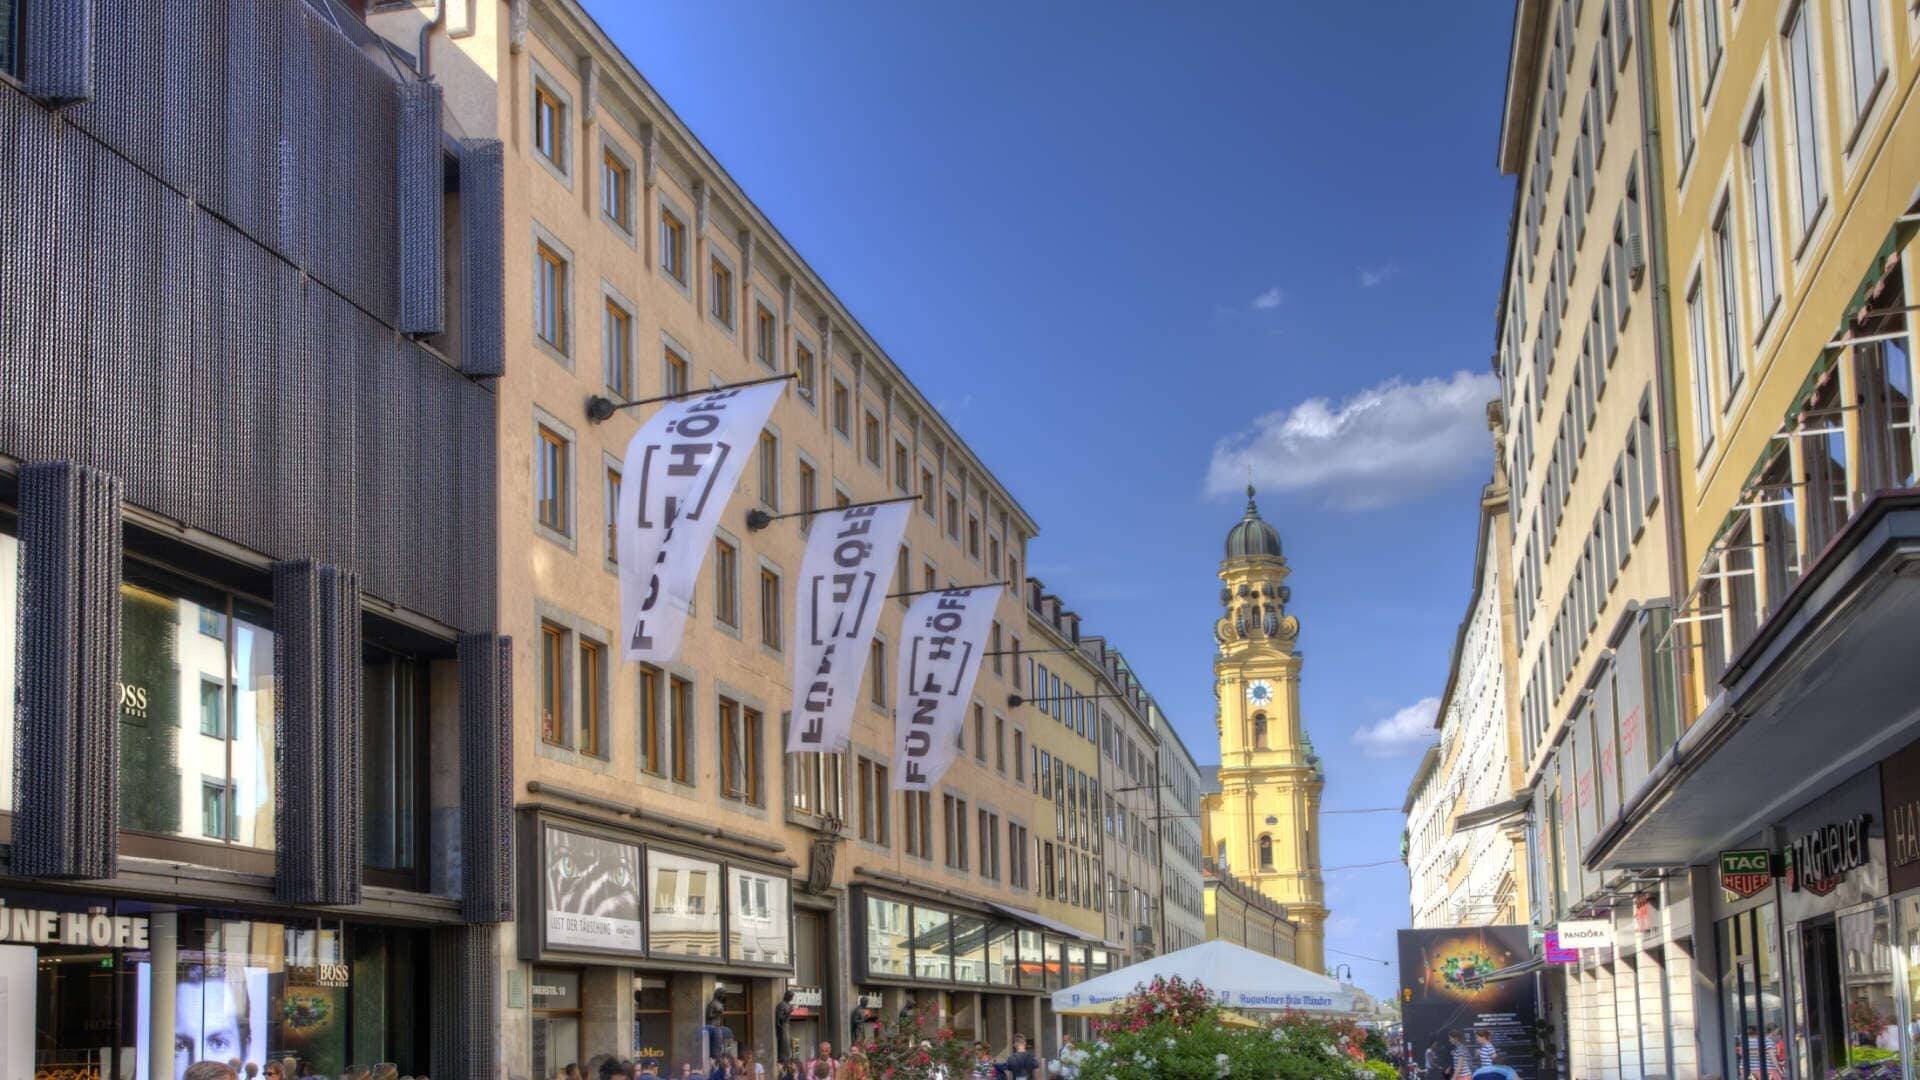 Immobilienmakler München Neubau Immobilien Rogers